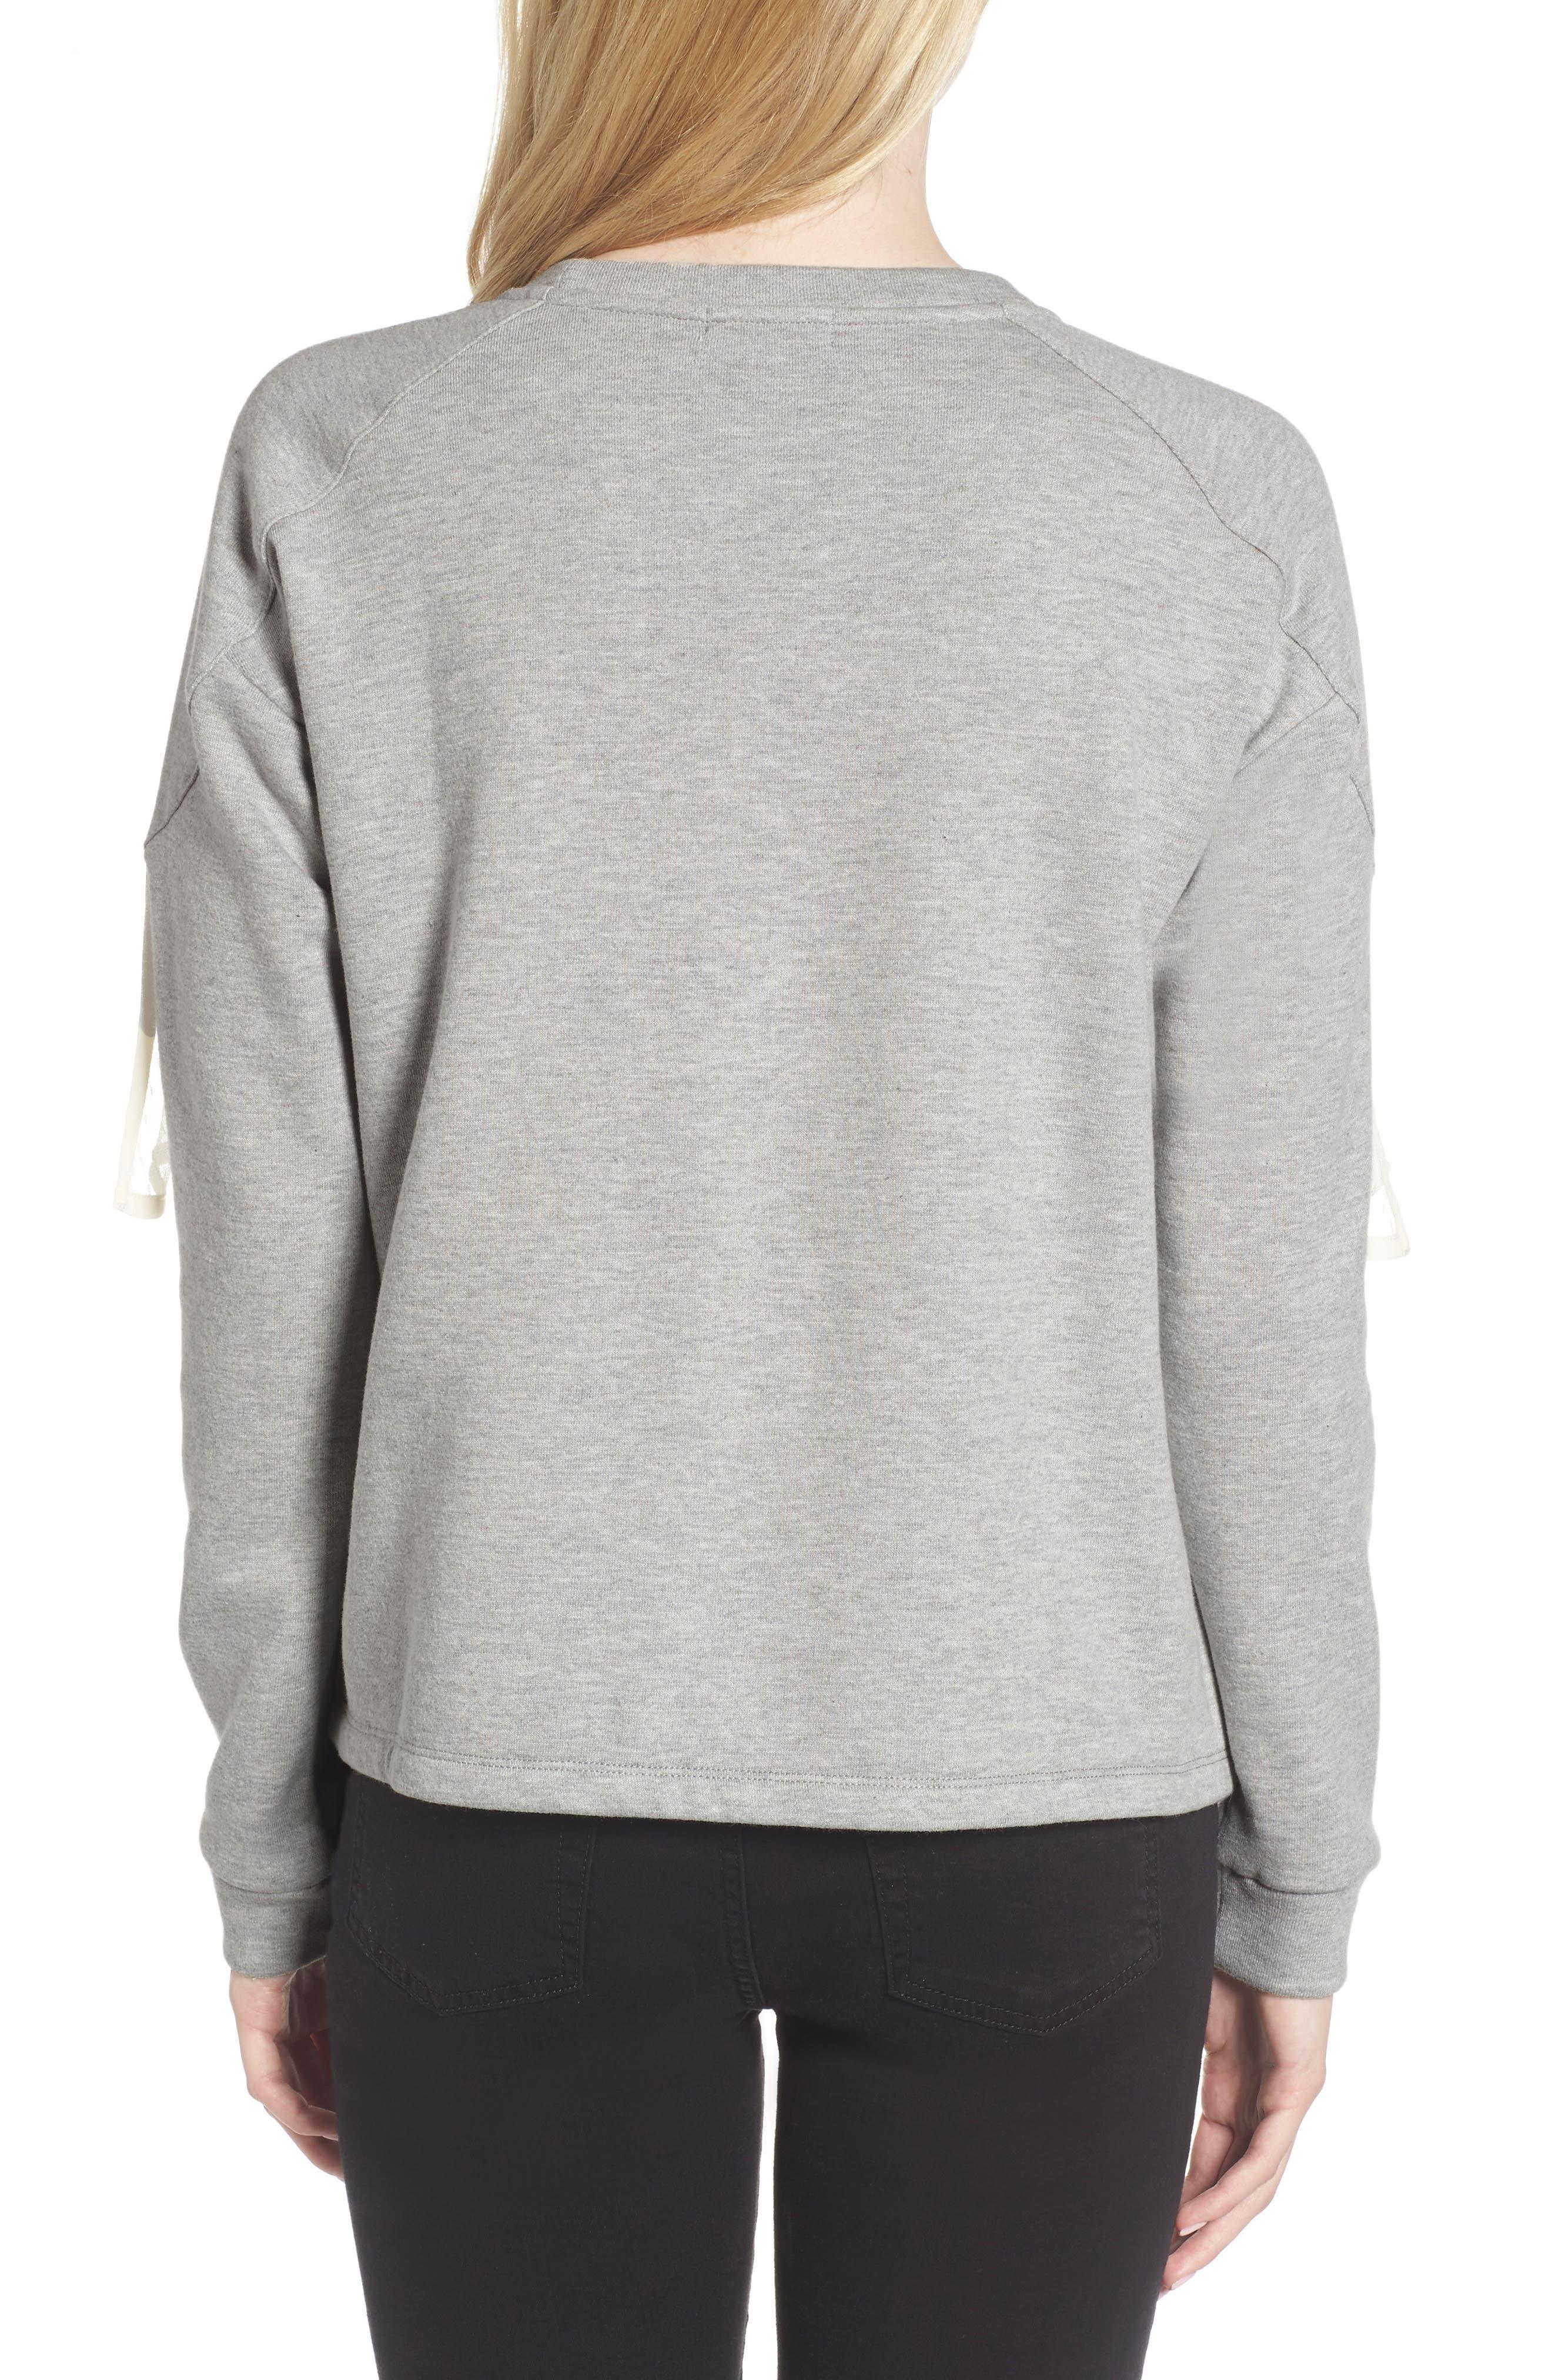 Mesh Ruffle Sweatshirt,                             Alternate thumbnail 2, color,                             033